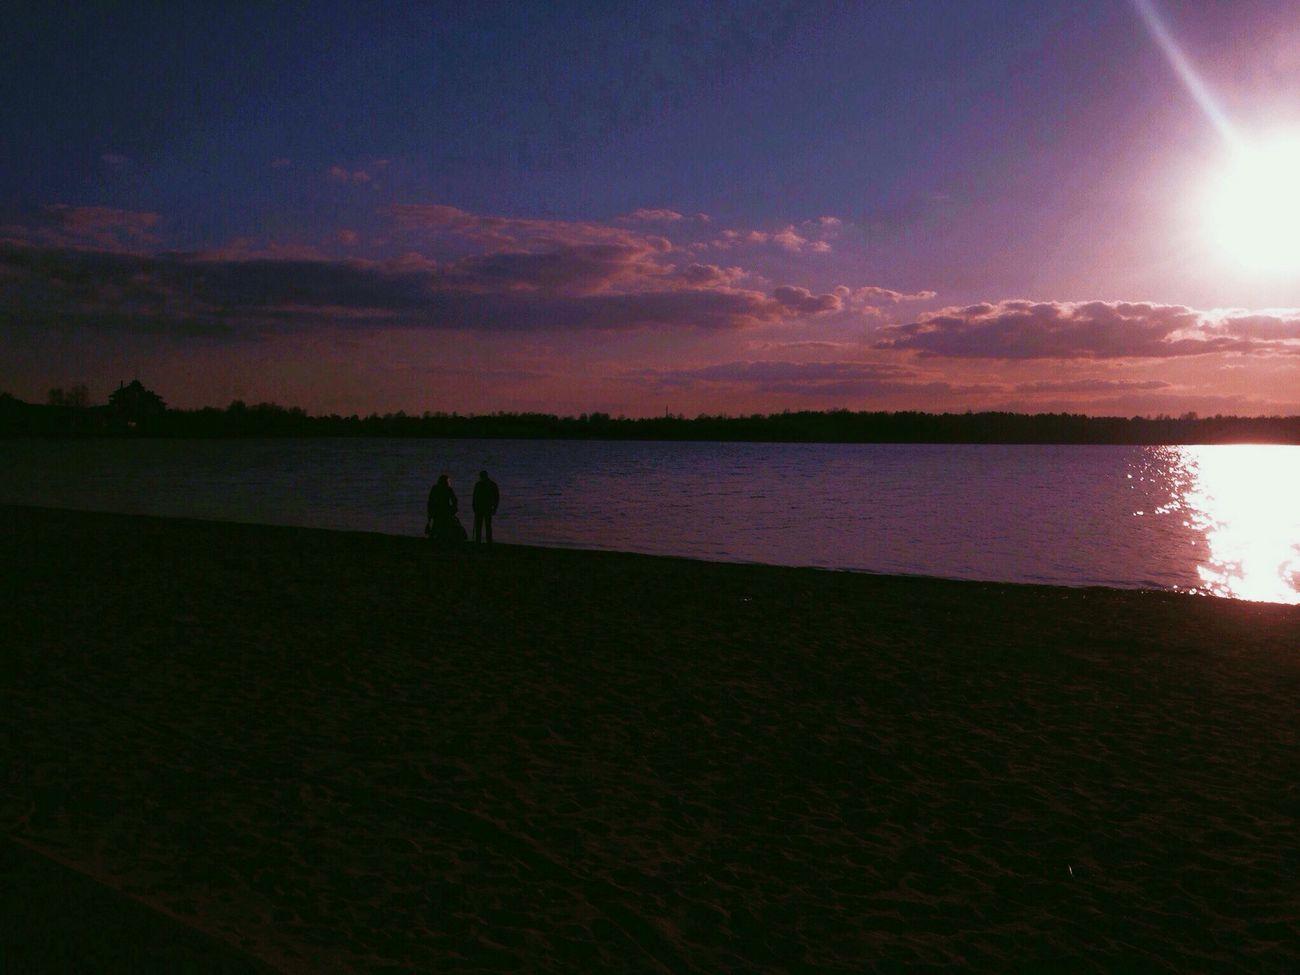 just enjoy sunset Enjoying The Sun Sunset_collection Sky The Great Outdoors - 2015 EyeEm Awards EyeEm Best Shots EyeEm Nature Lover